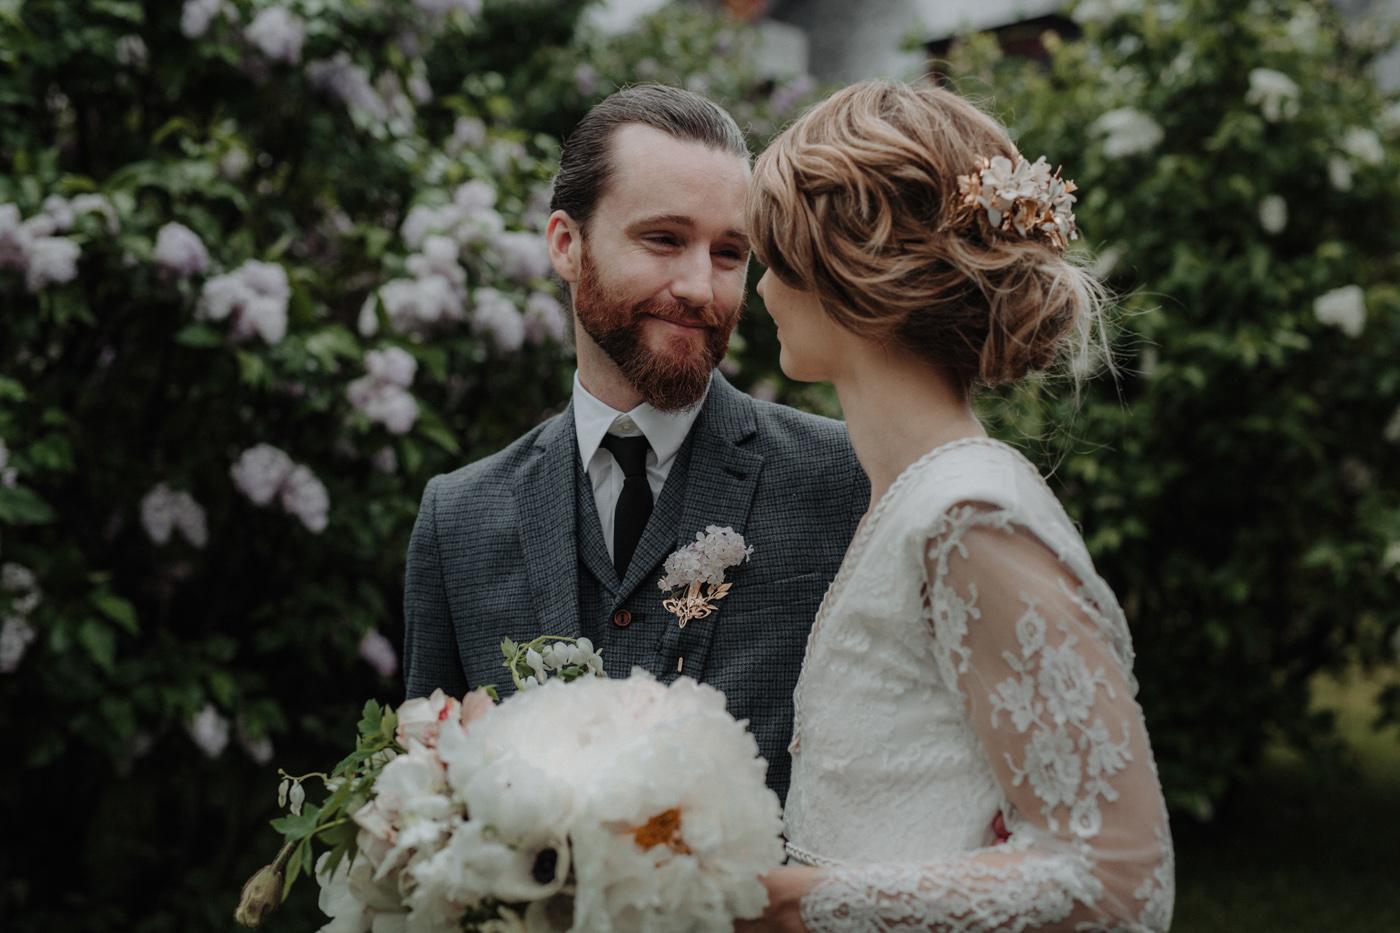 Erin-Mike-Intimate-Vintage-Wedding-Shelburne-Farms-Vermont -124.jpg